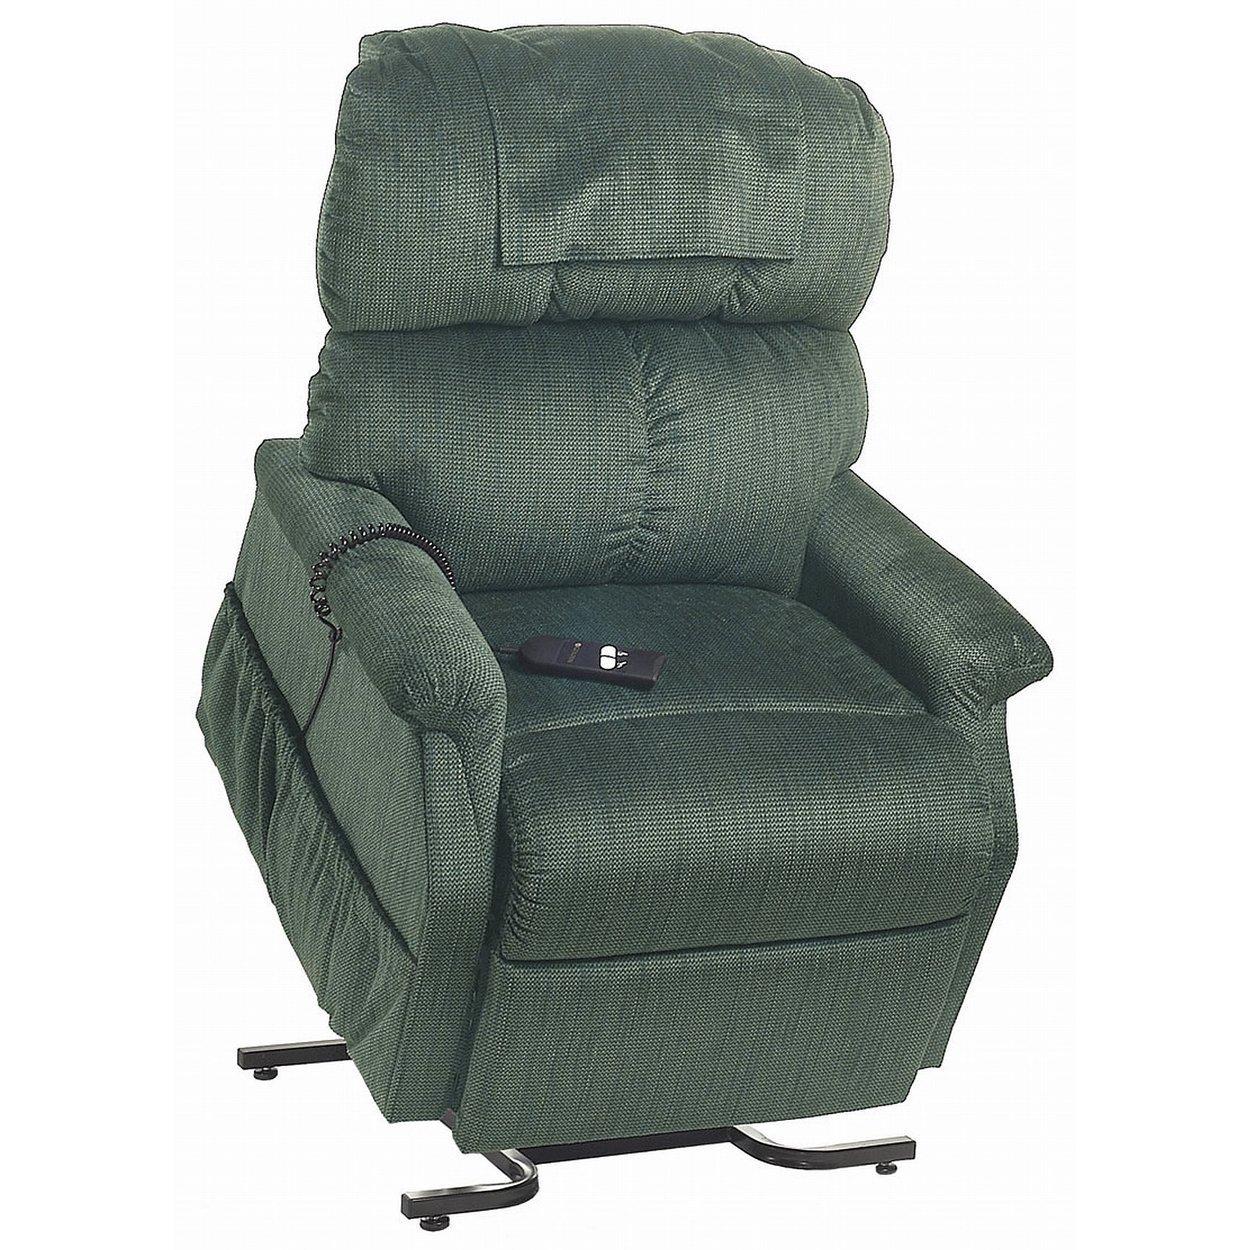 Amazoncom Golden Technologies PR 501L Comforter Lift Chair